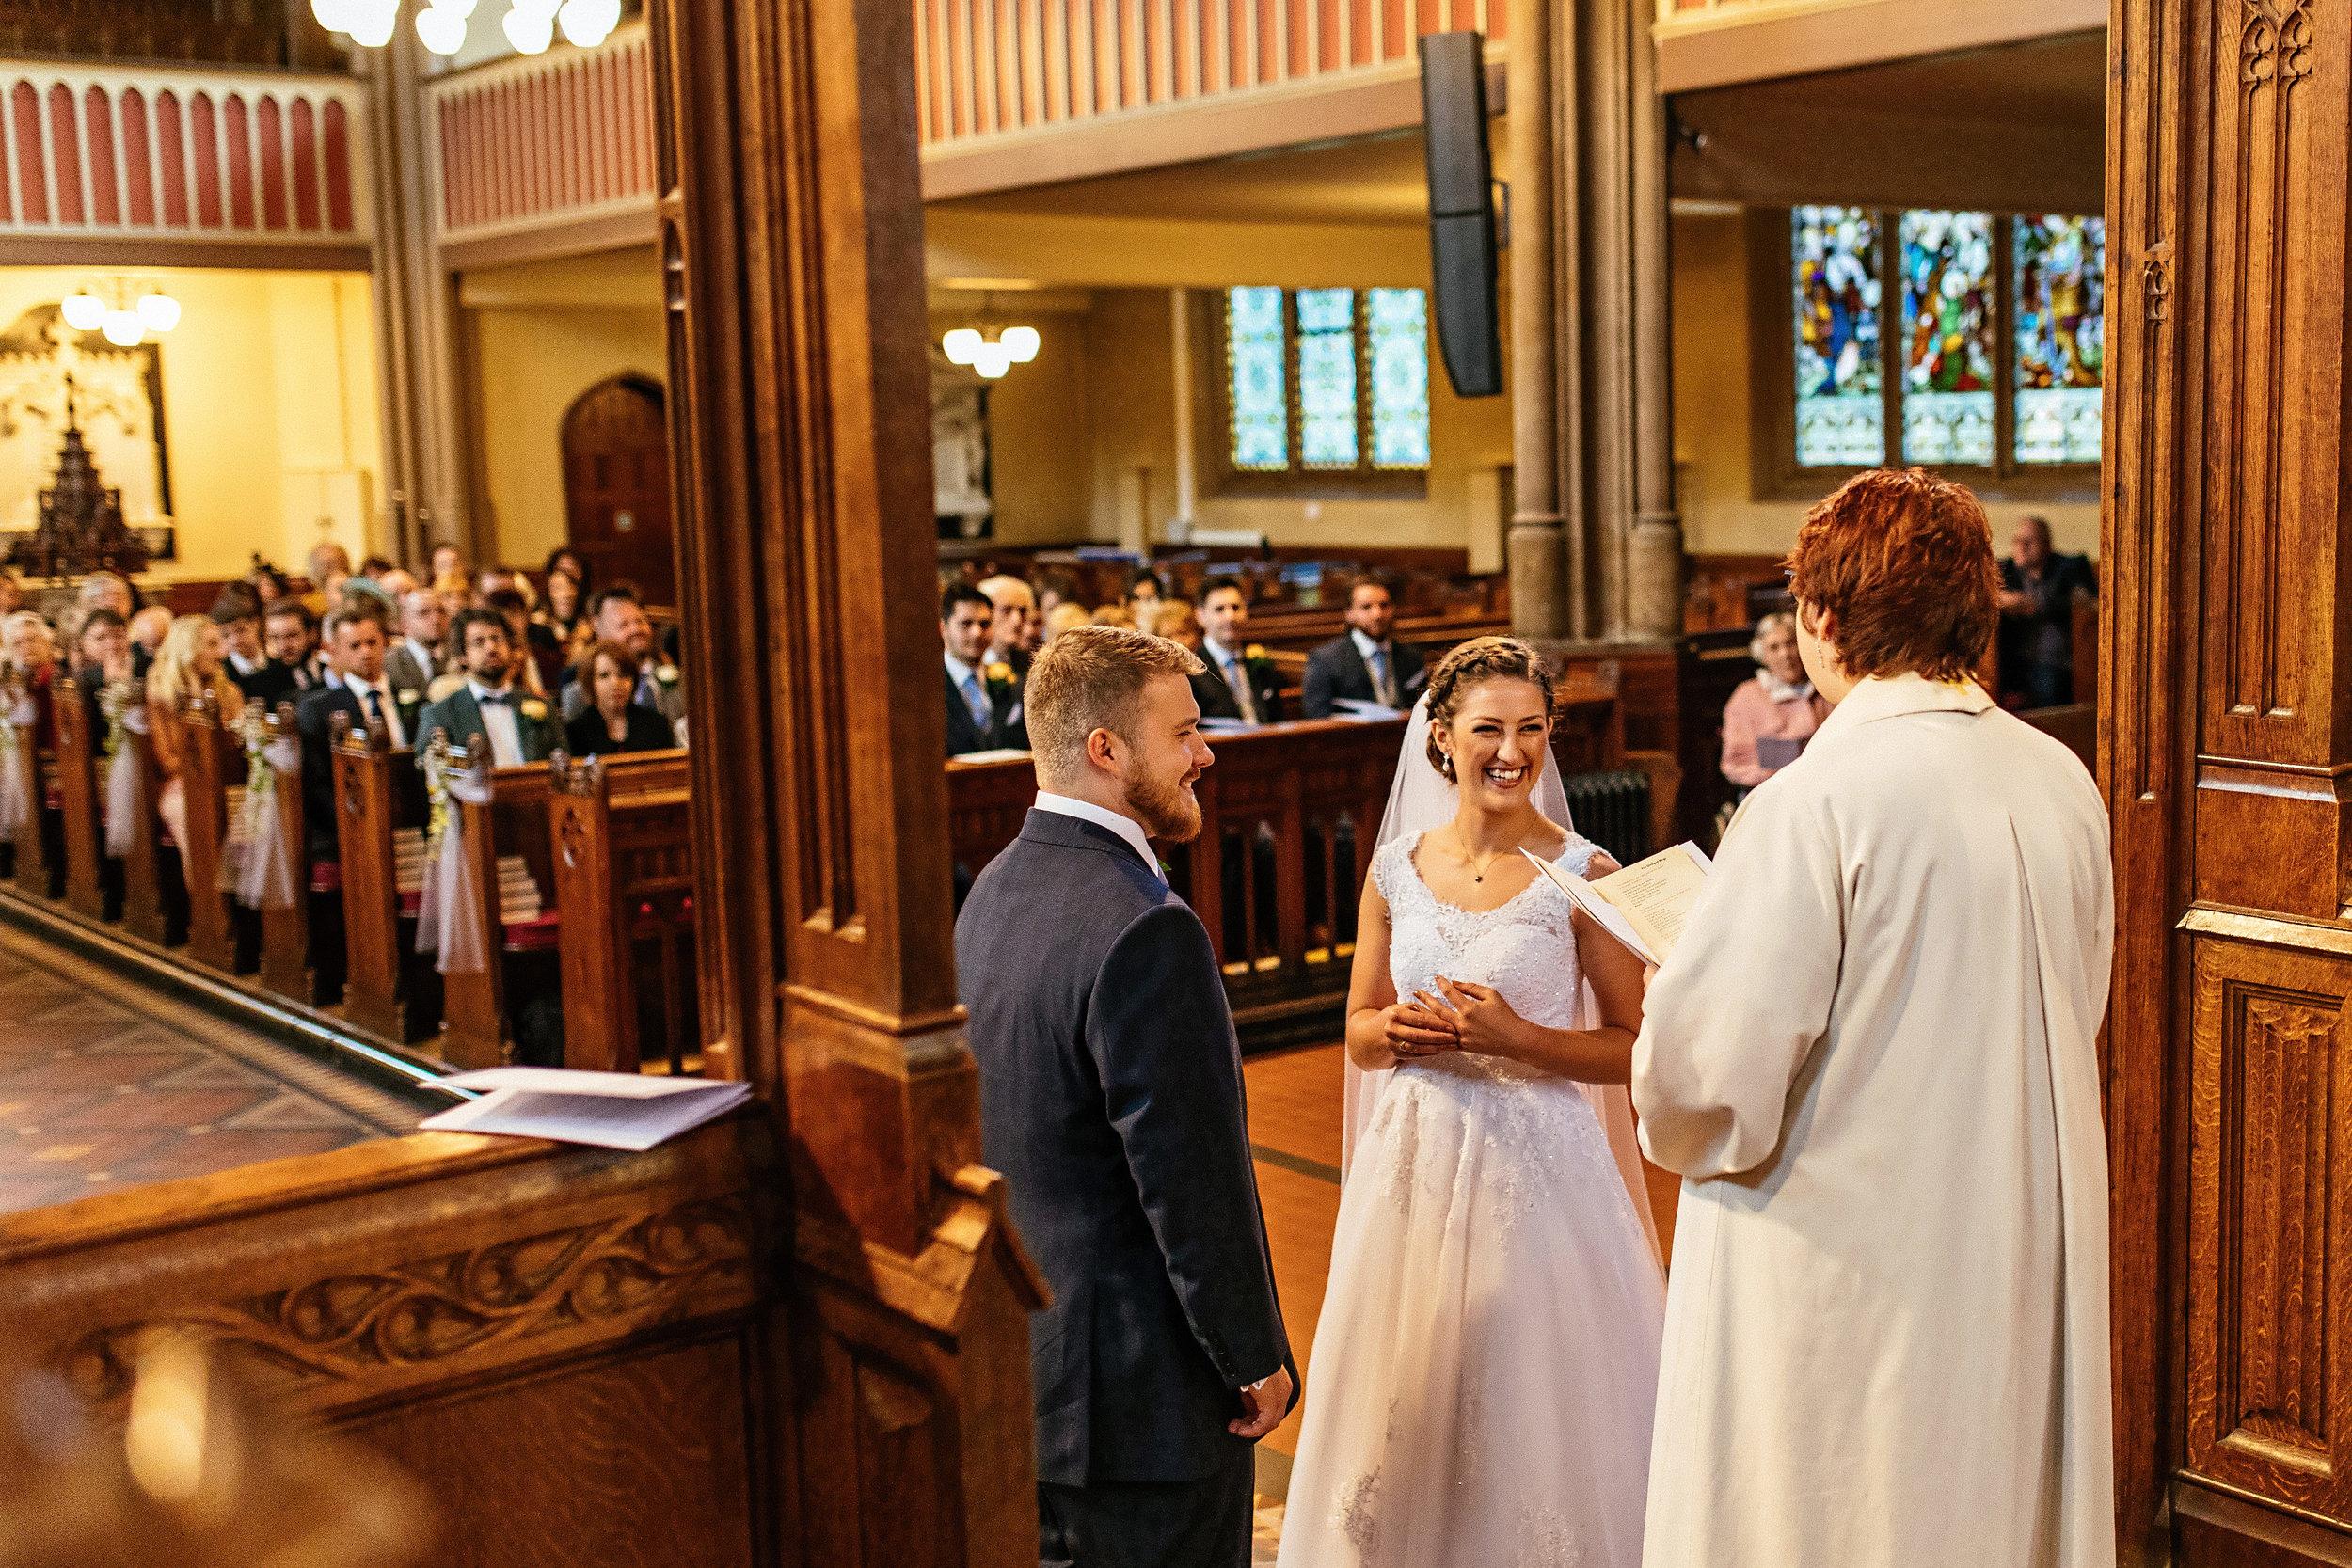 Kathryn-and-Mike-Wedding-Highlights-26.jpg